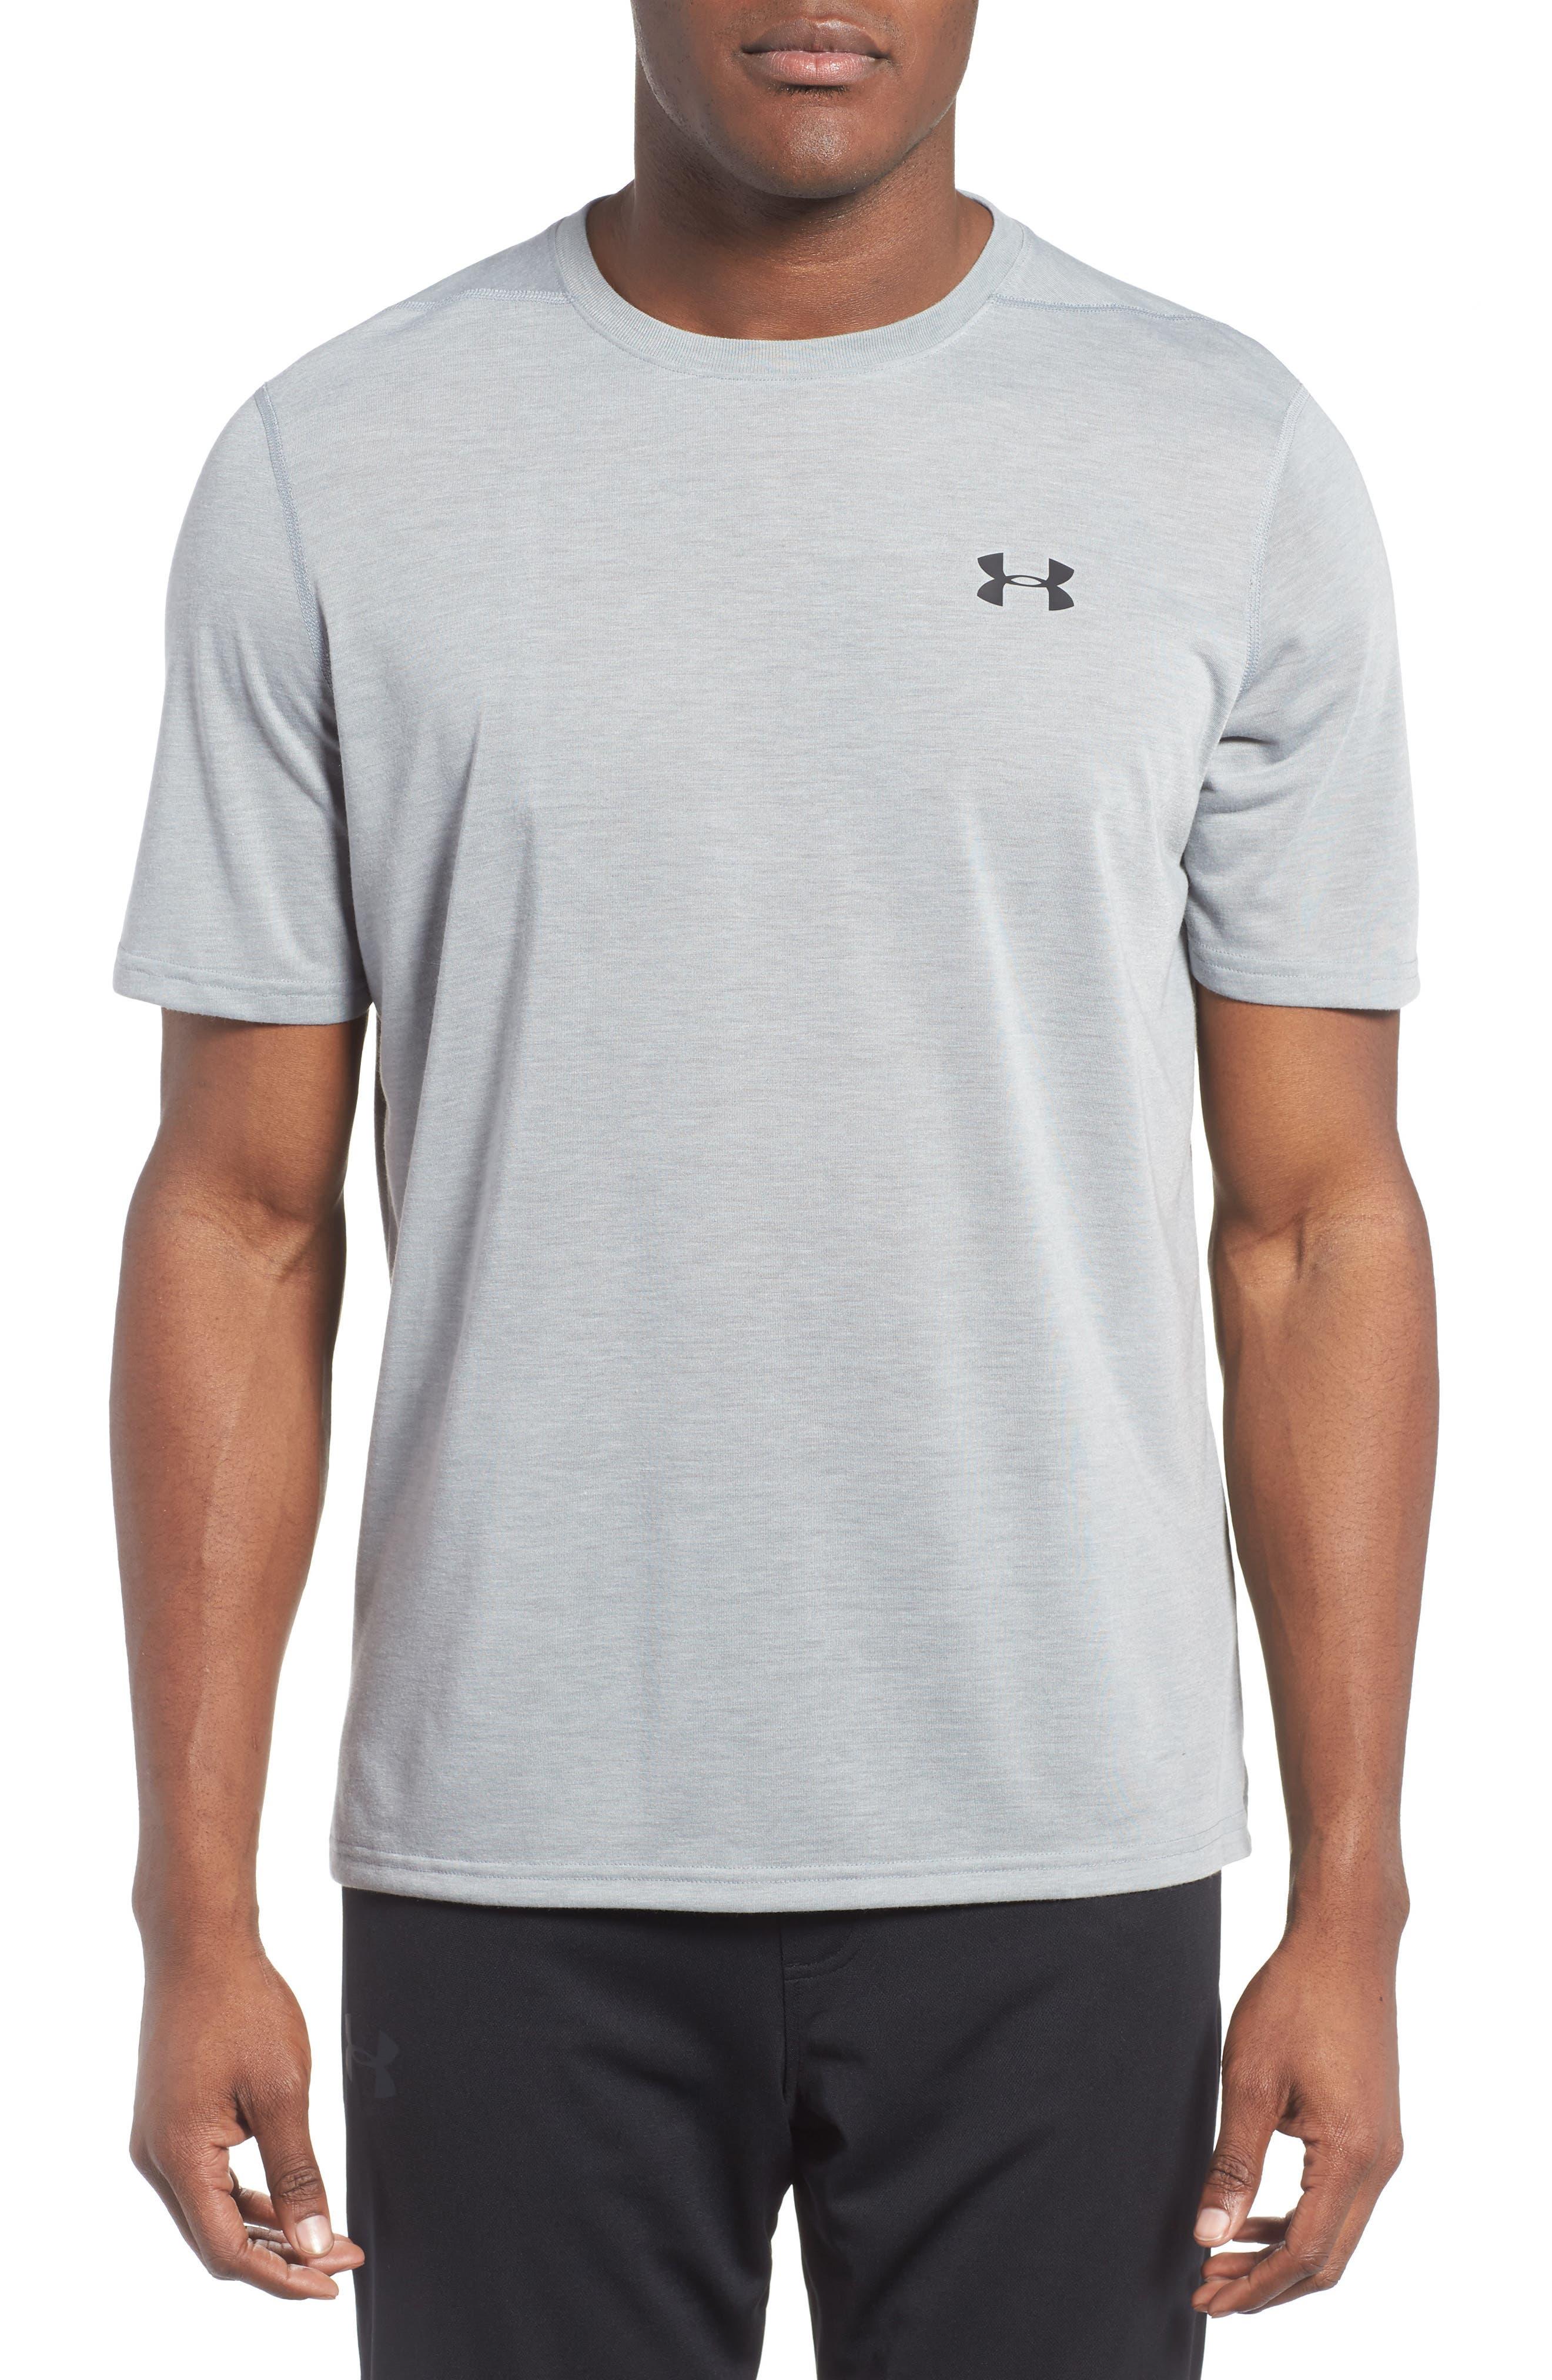 white under armour shirt